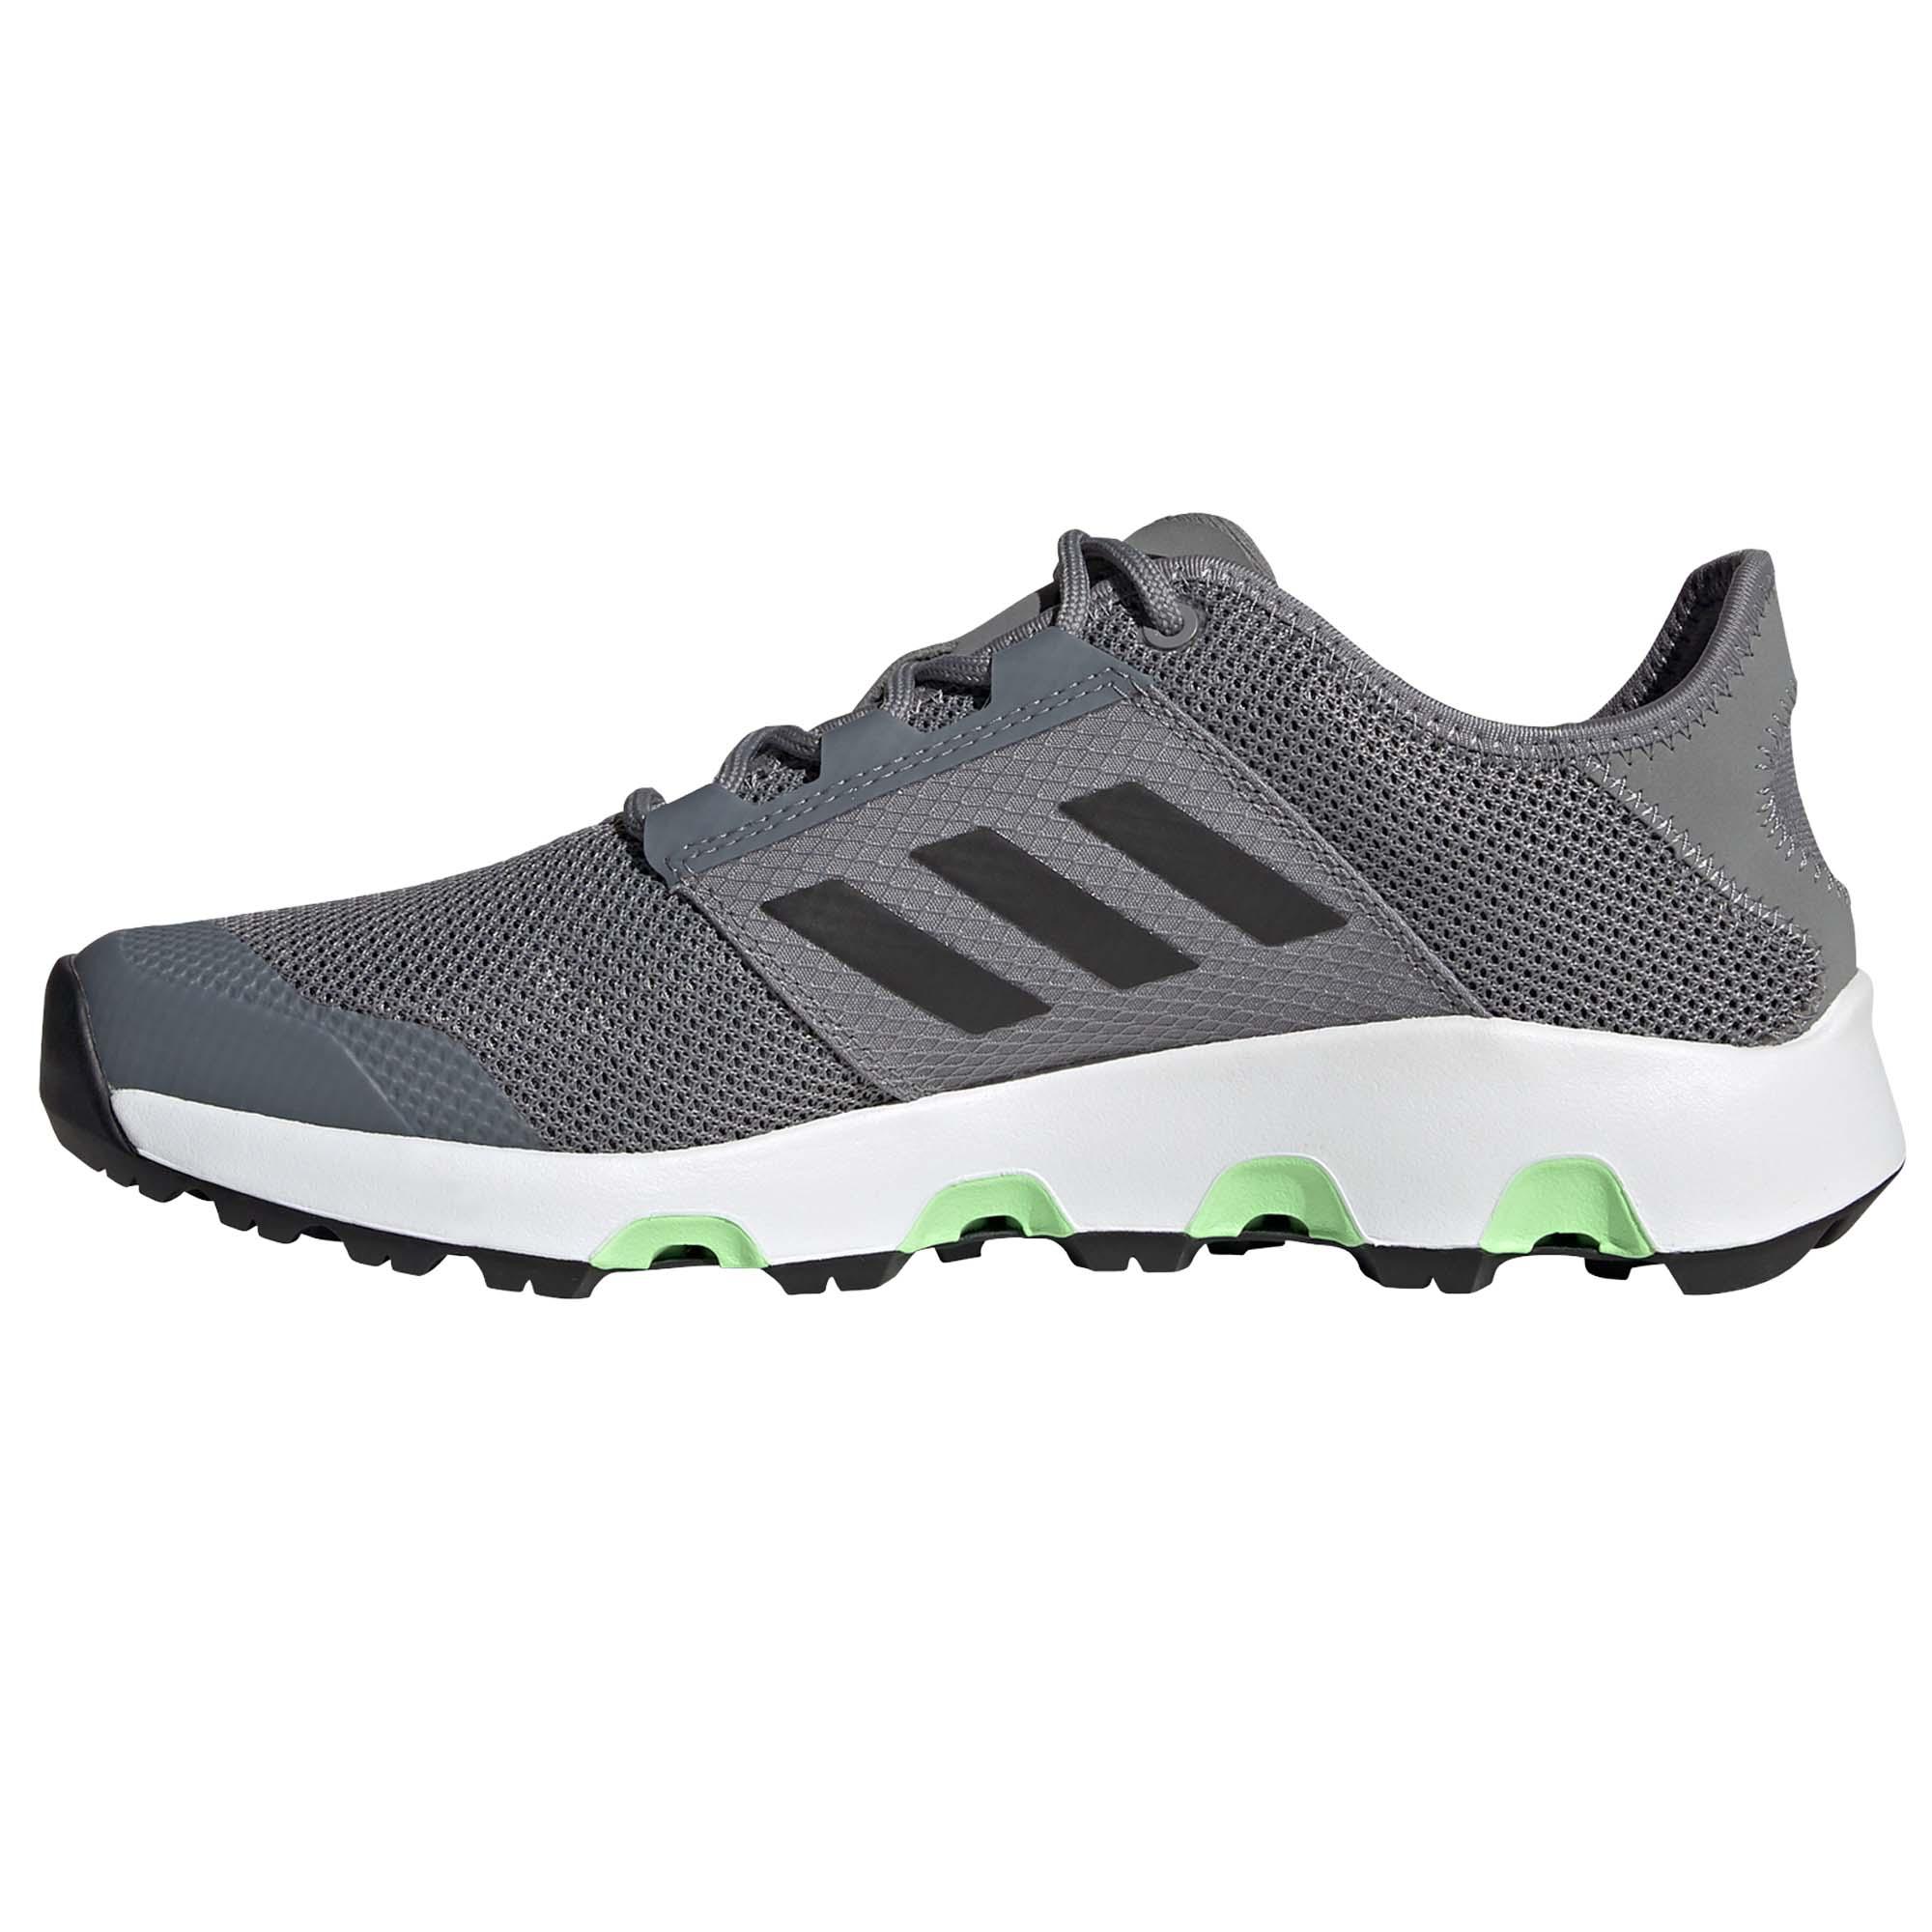 miniature 8 - Adidas Terrex Voyager Homme Trail Running Baskets Chaussures Gris/Noir/Vert